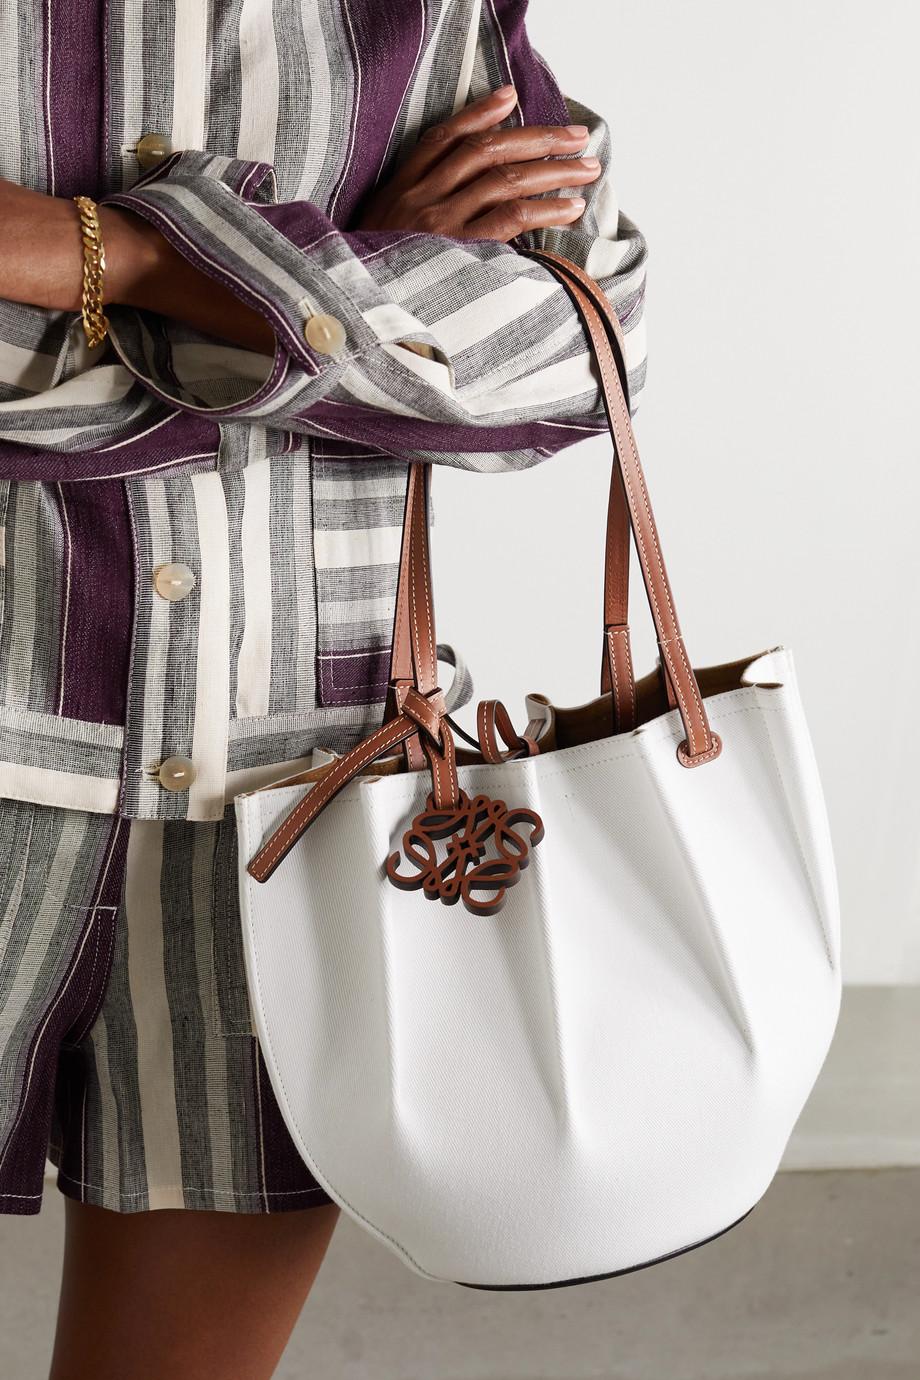 Loewe + Paula's Ibiza Shell small leather-trimmed denim tote